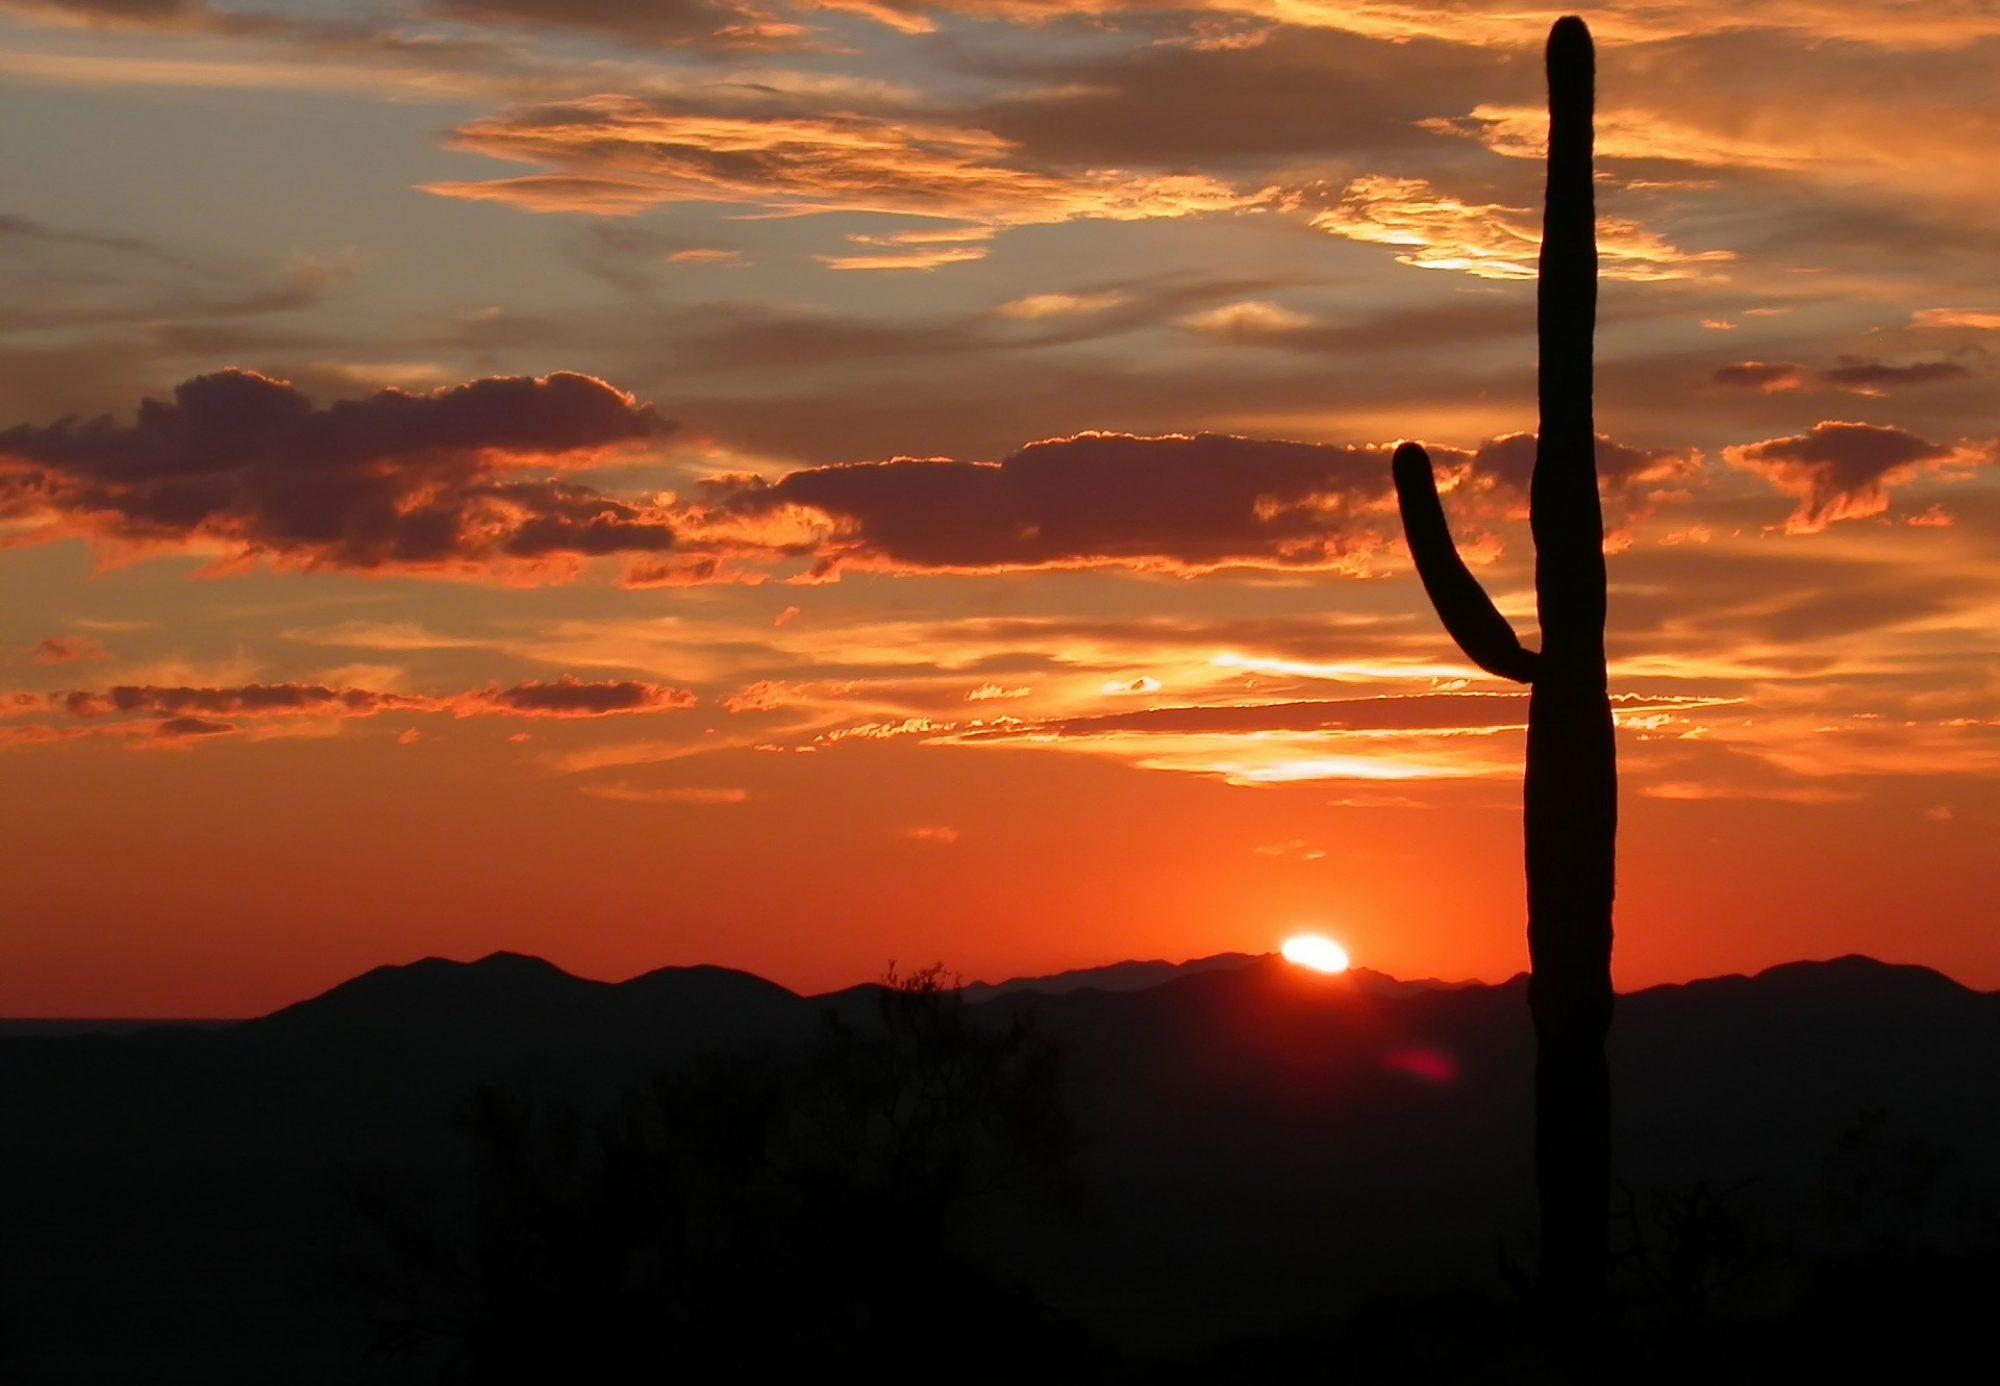 SONORAN DESERT JOURNALISTS